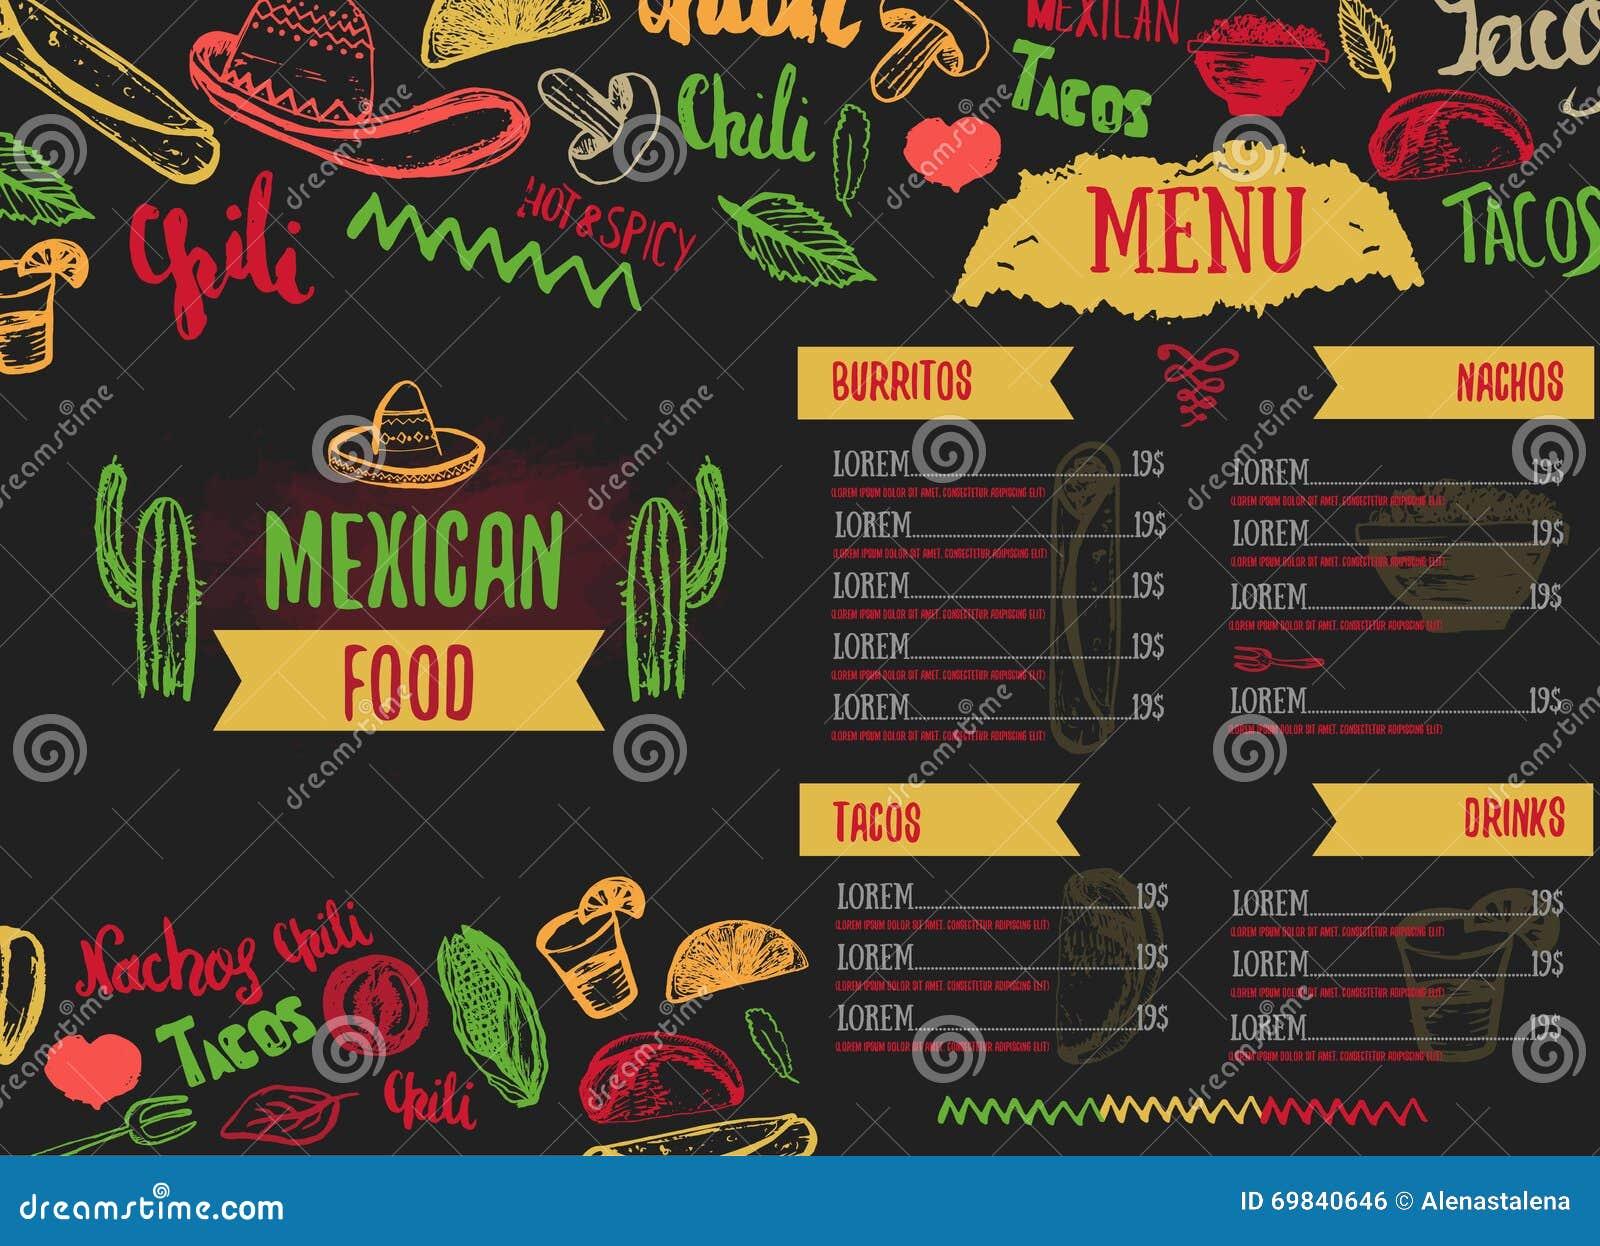 Max S Mexican Restaurant